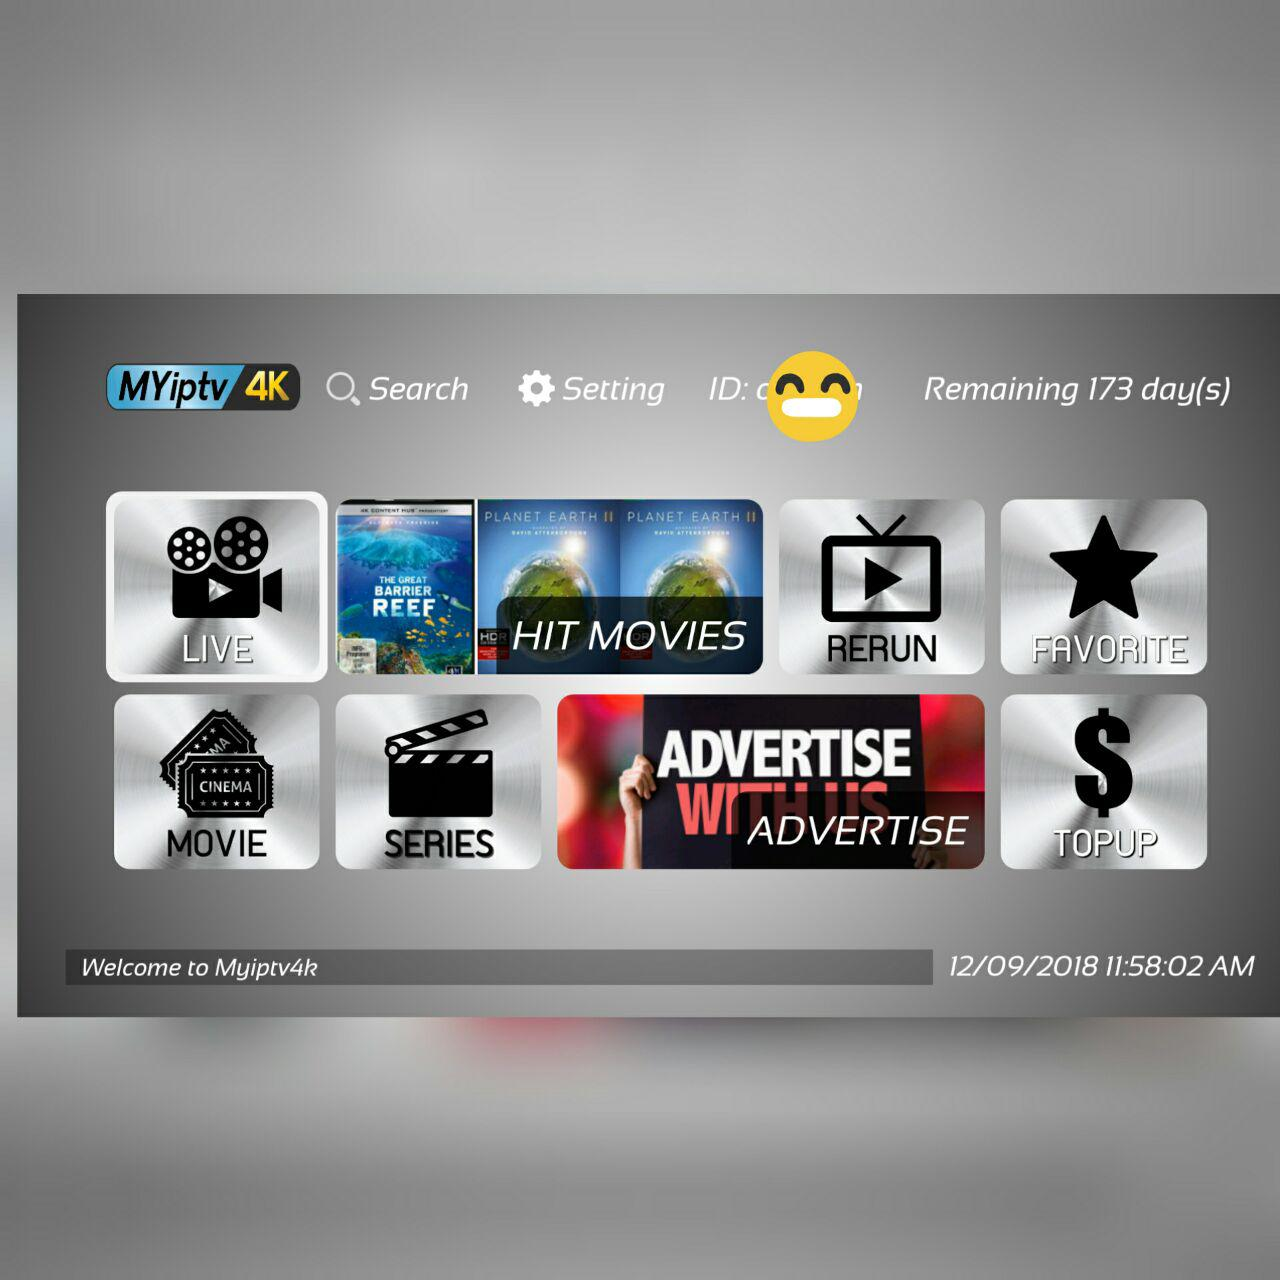 ANDROID TV BOX IPTV: CARA UPDATE MYIPTV4K APK